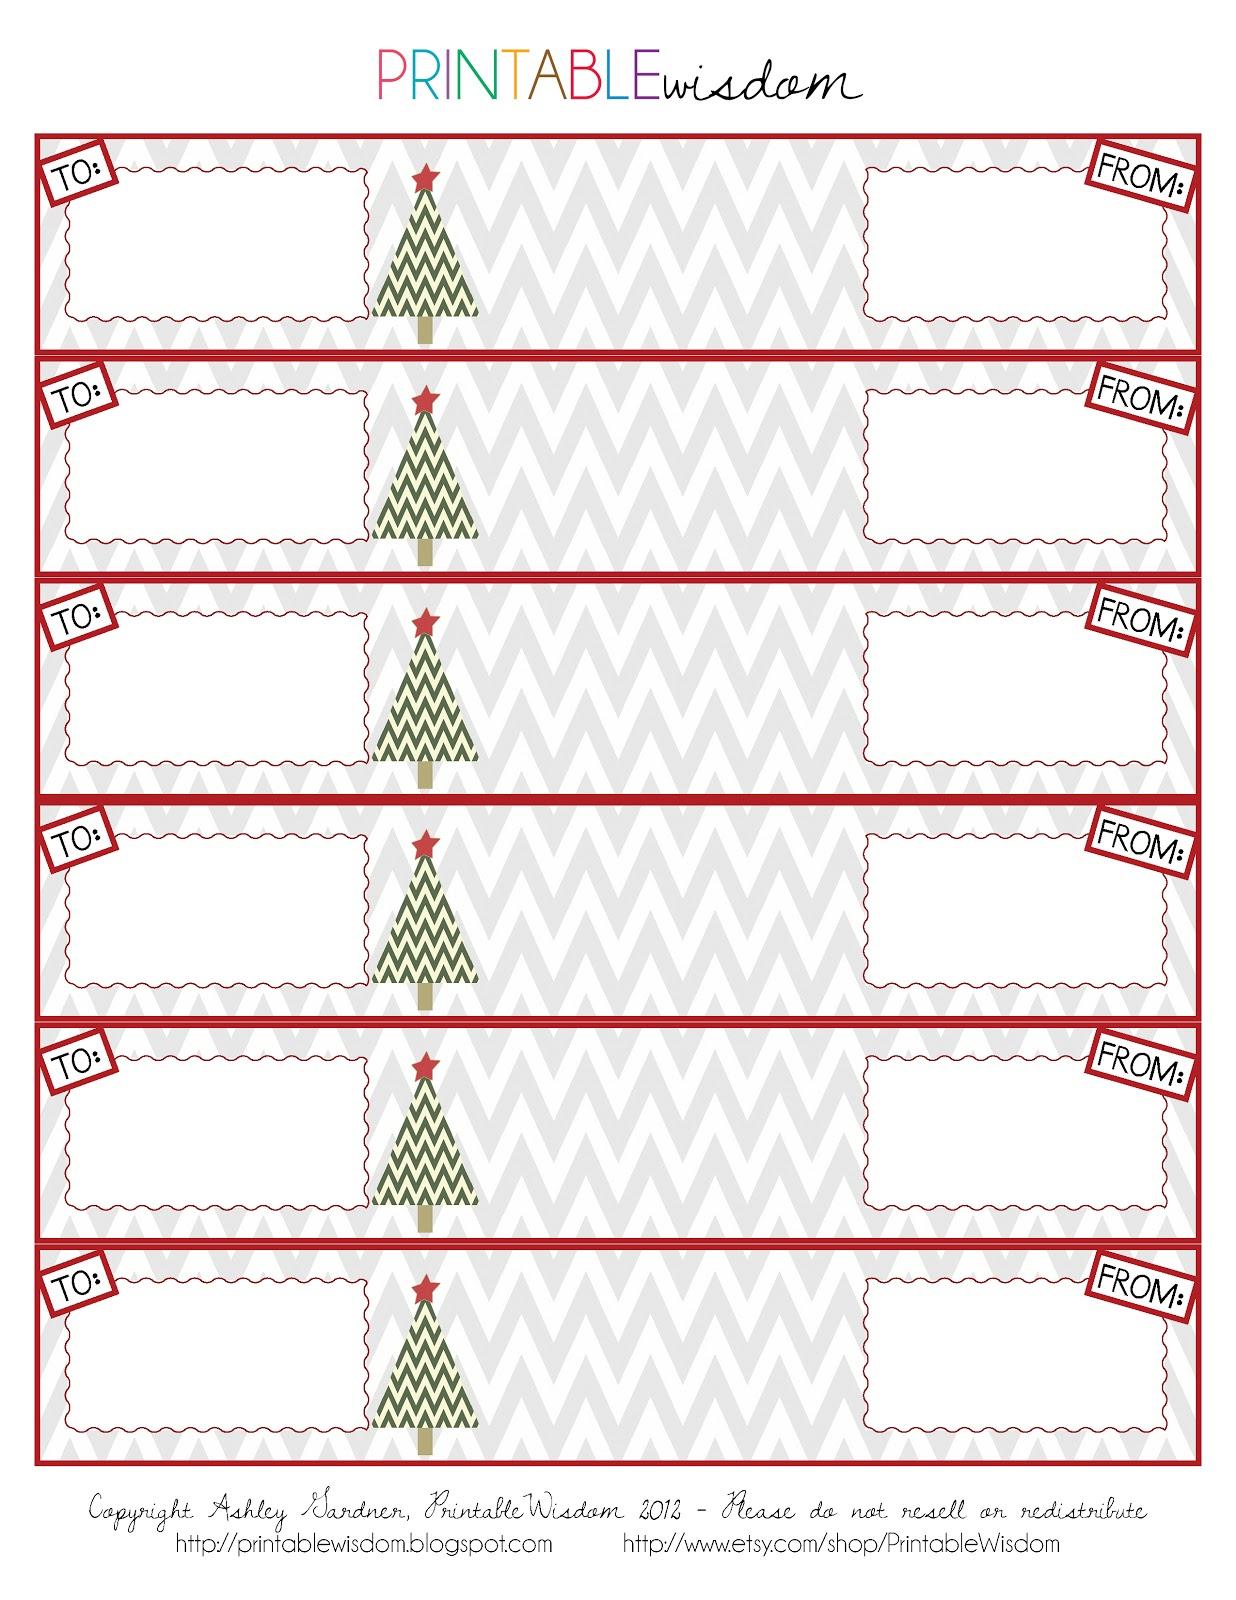 012 Template Ideas Address Label Templates Free Printable Christmas - Free Printable Return Address Labels